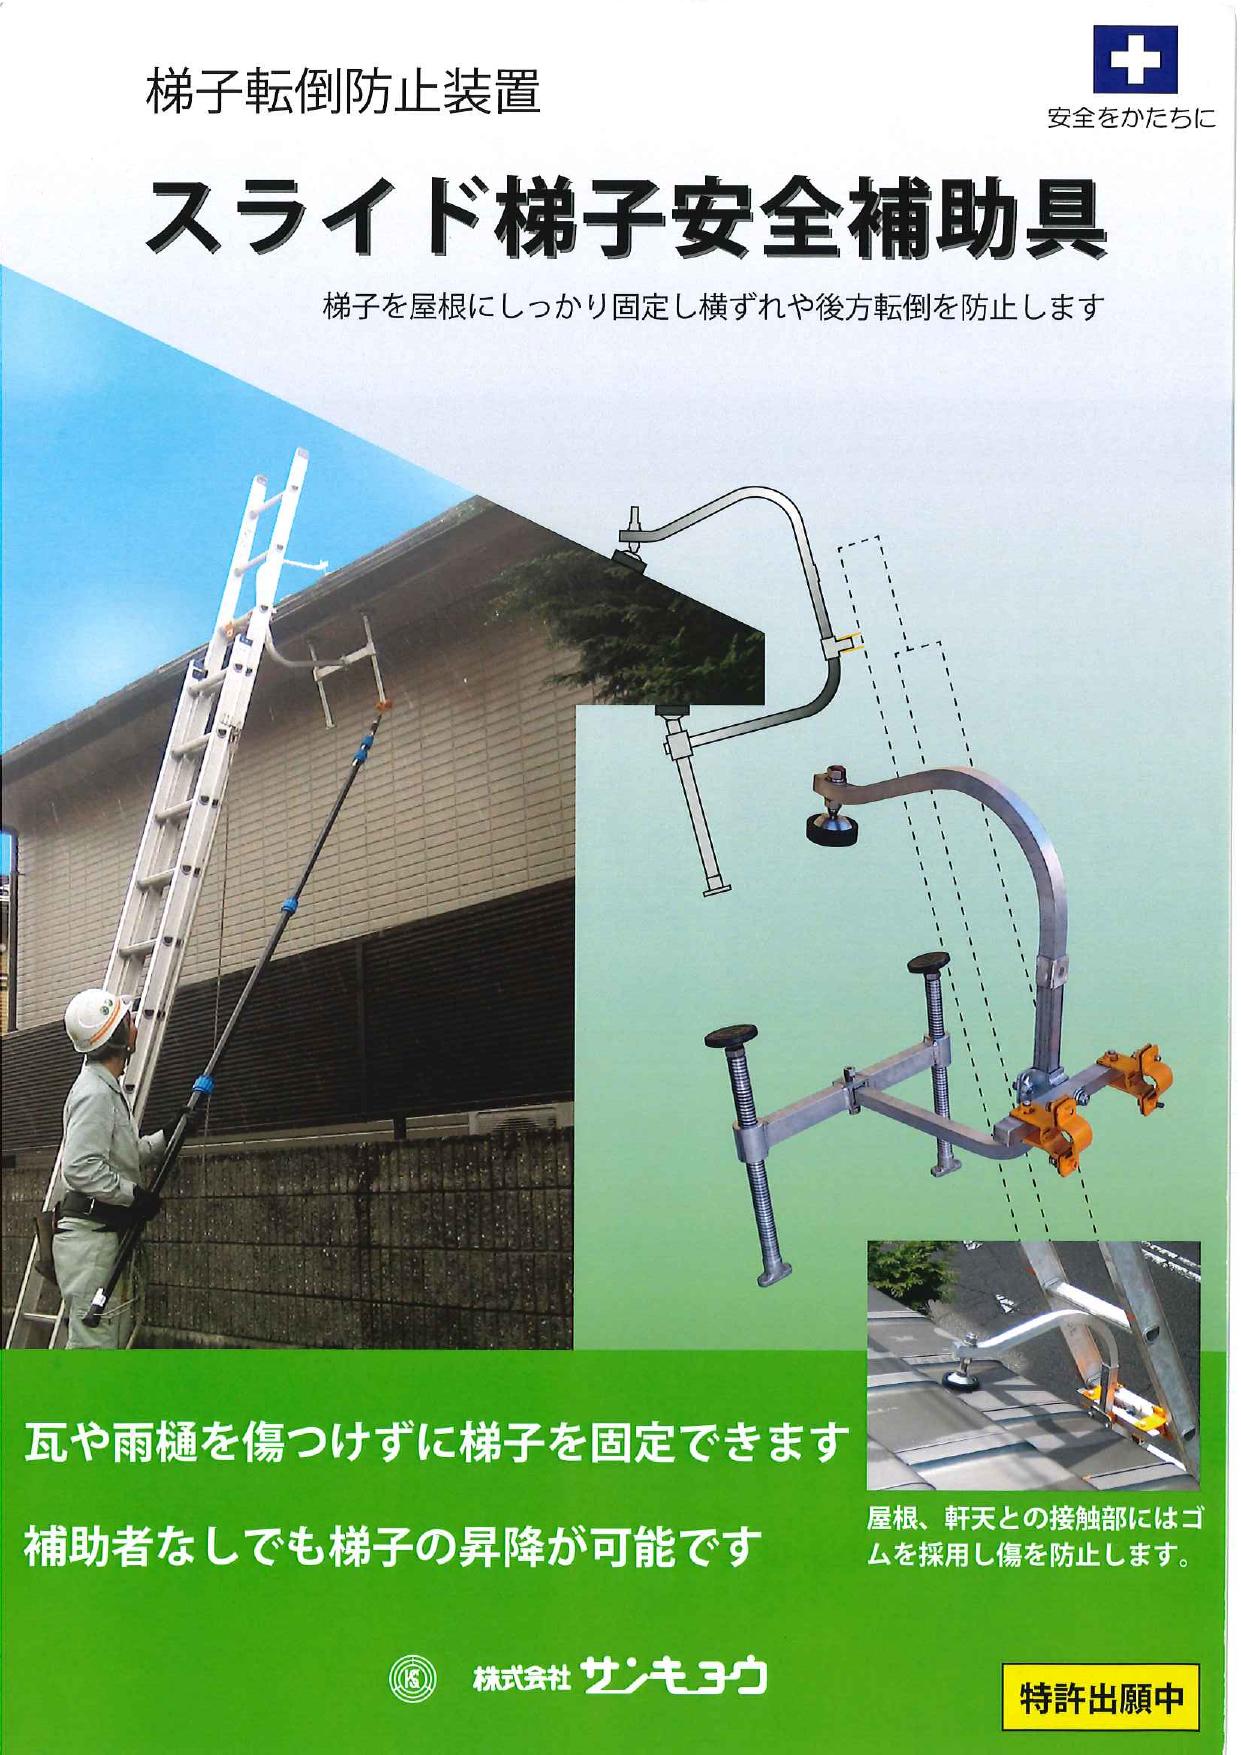 梯子転倒防止装置 スライド梯子安全補助具